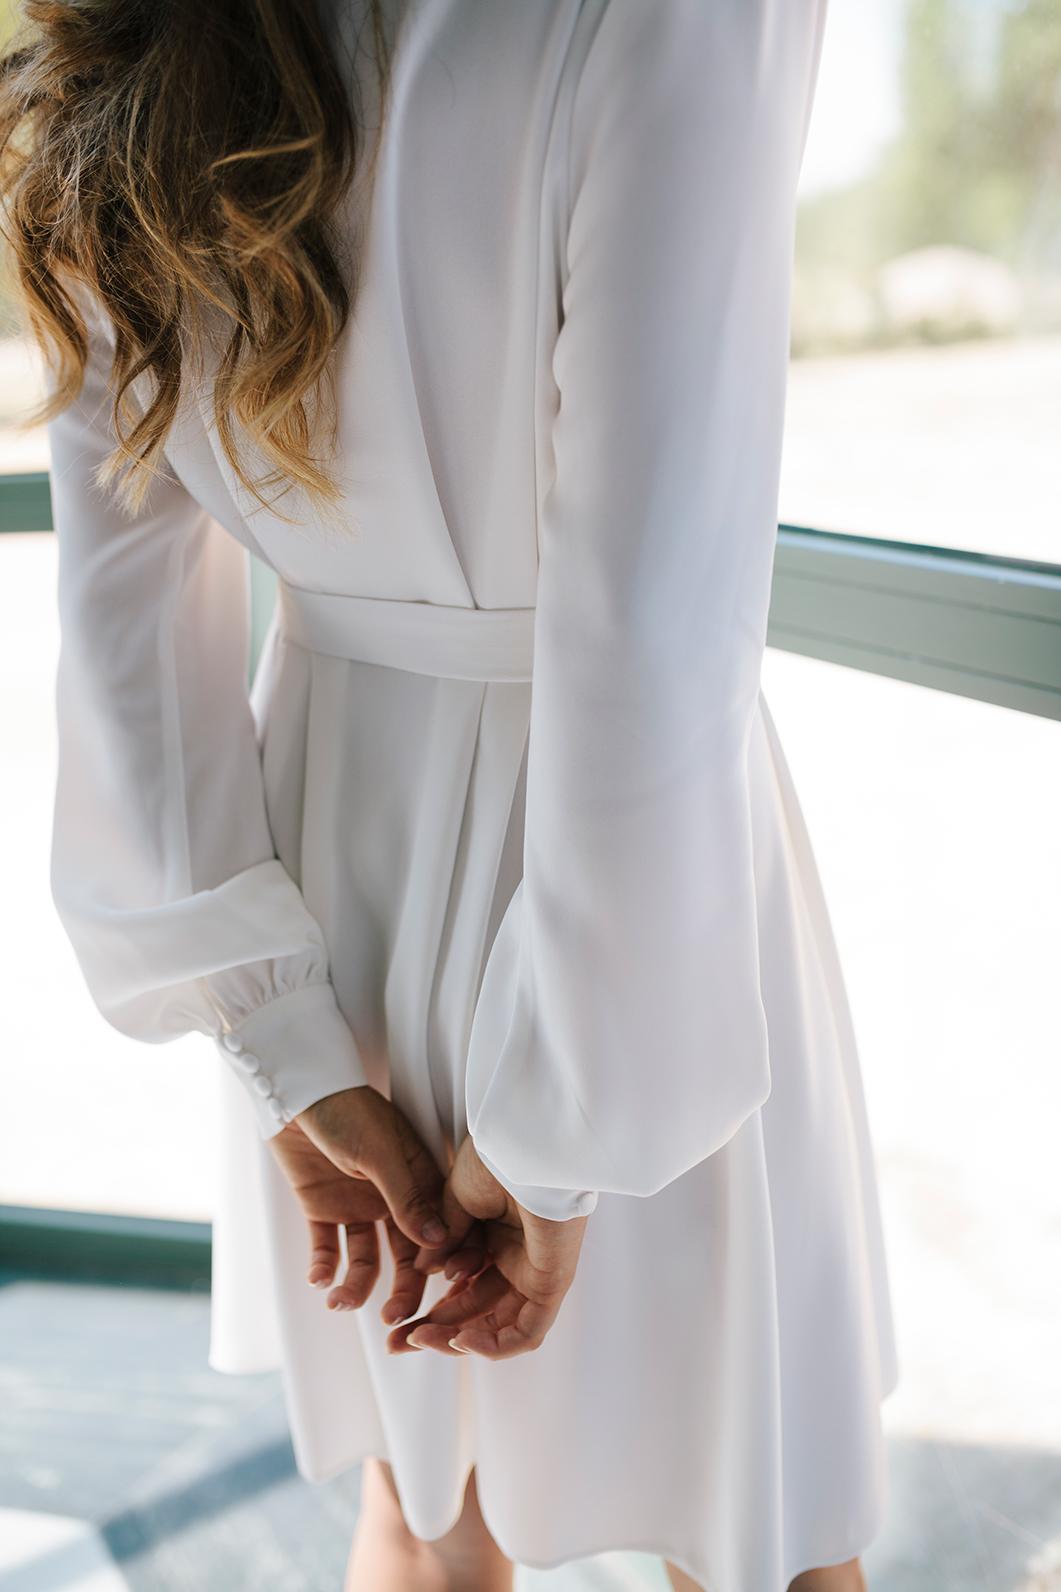 Be You Bebas Brautkleider White Concepts Brautmode Aachen